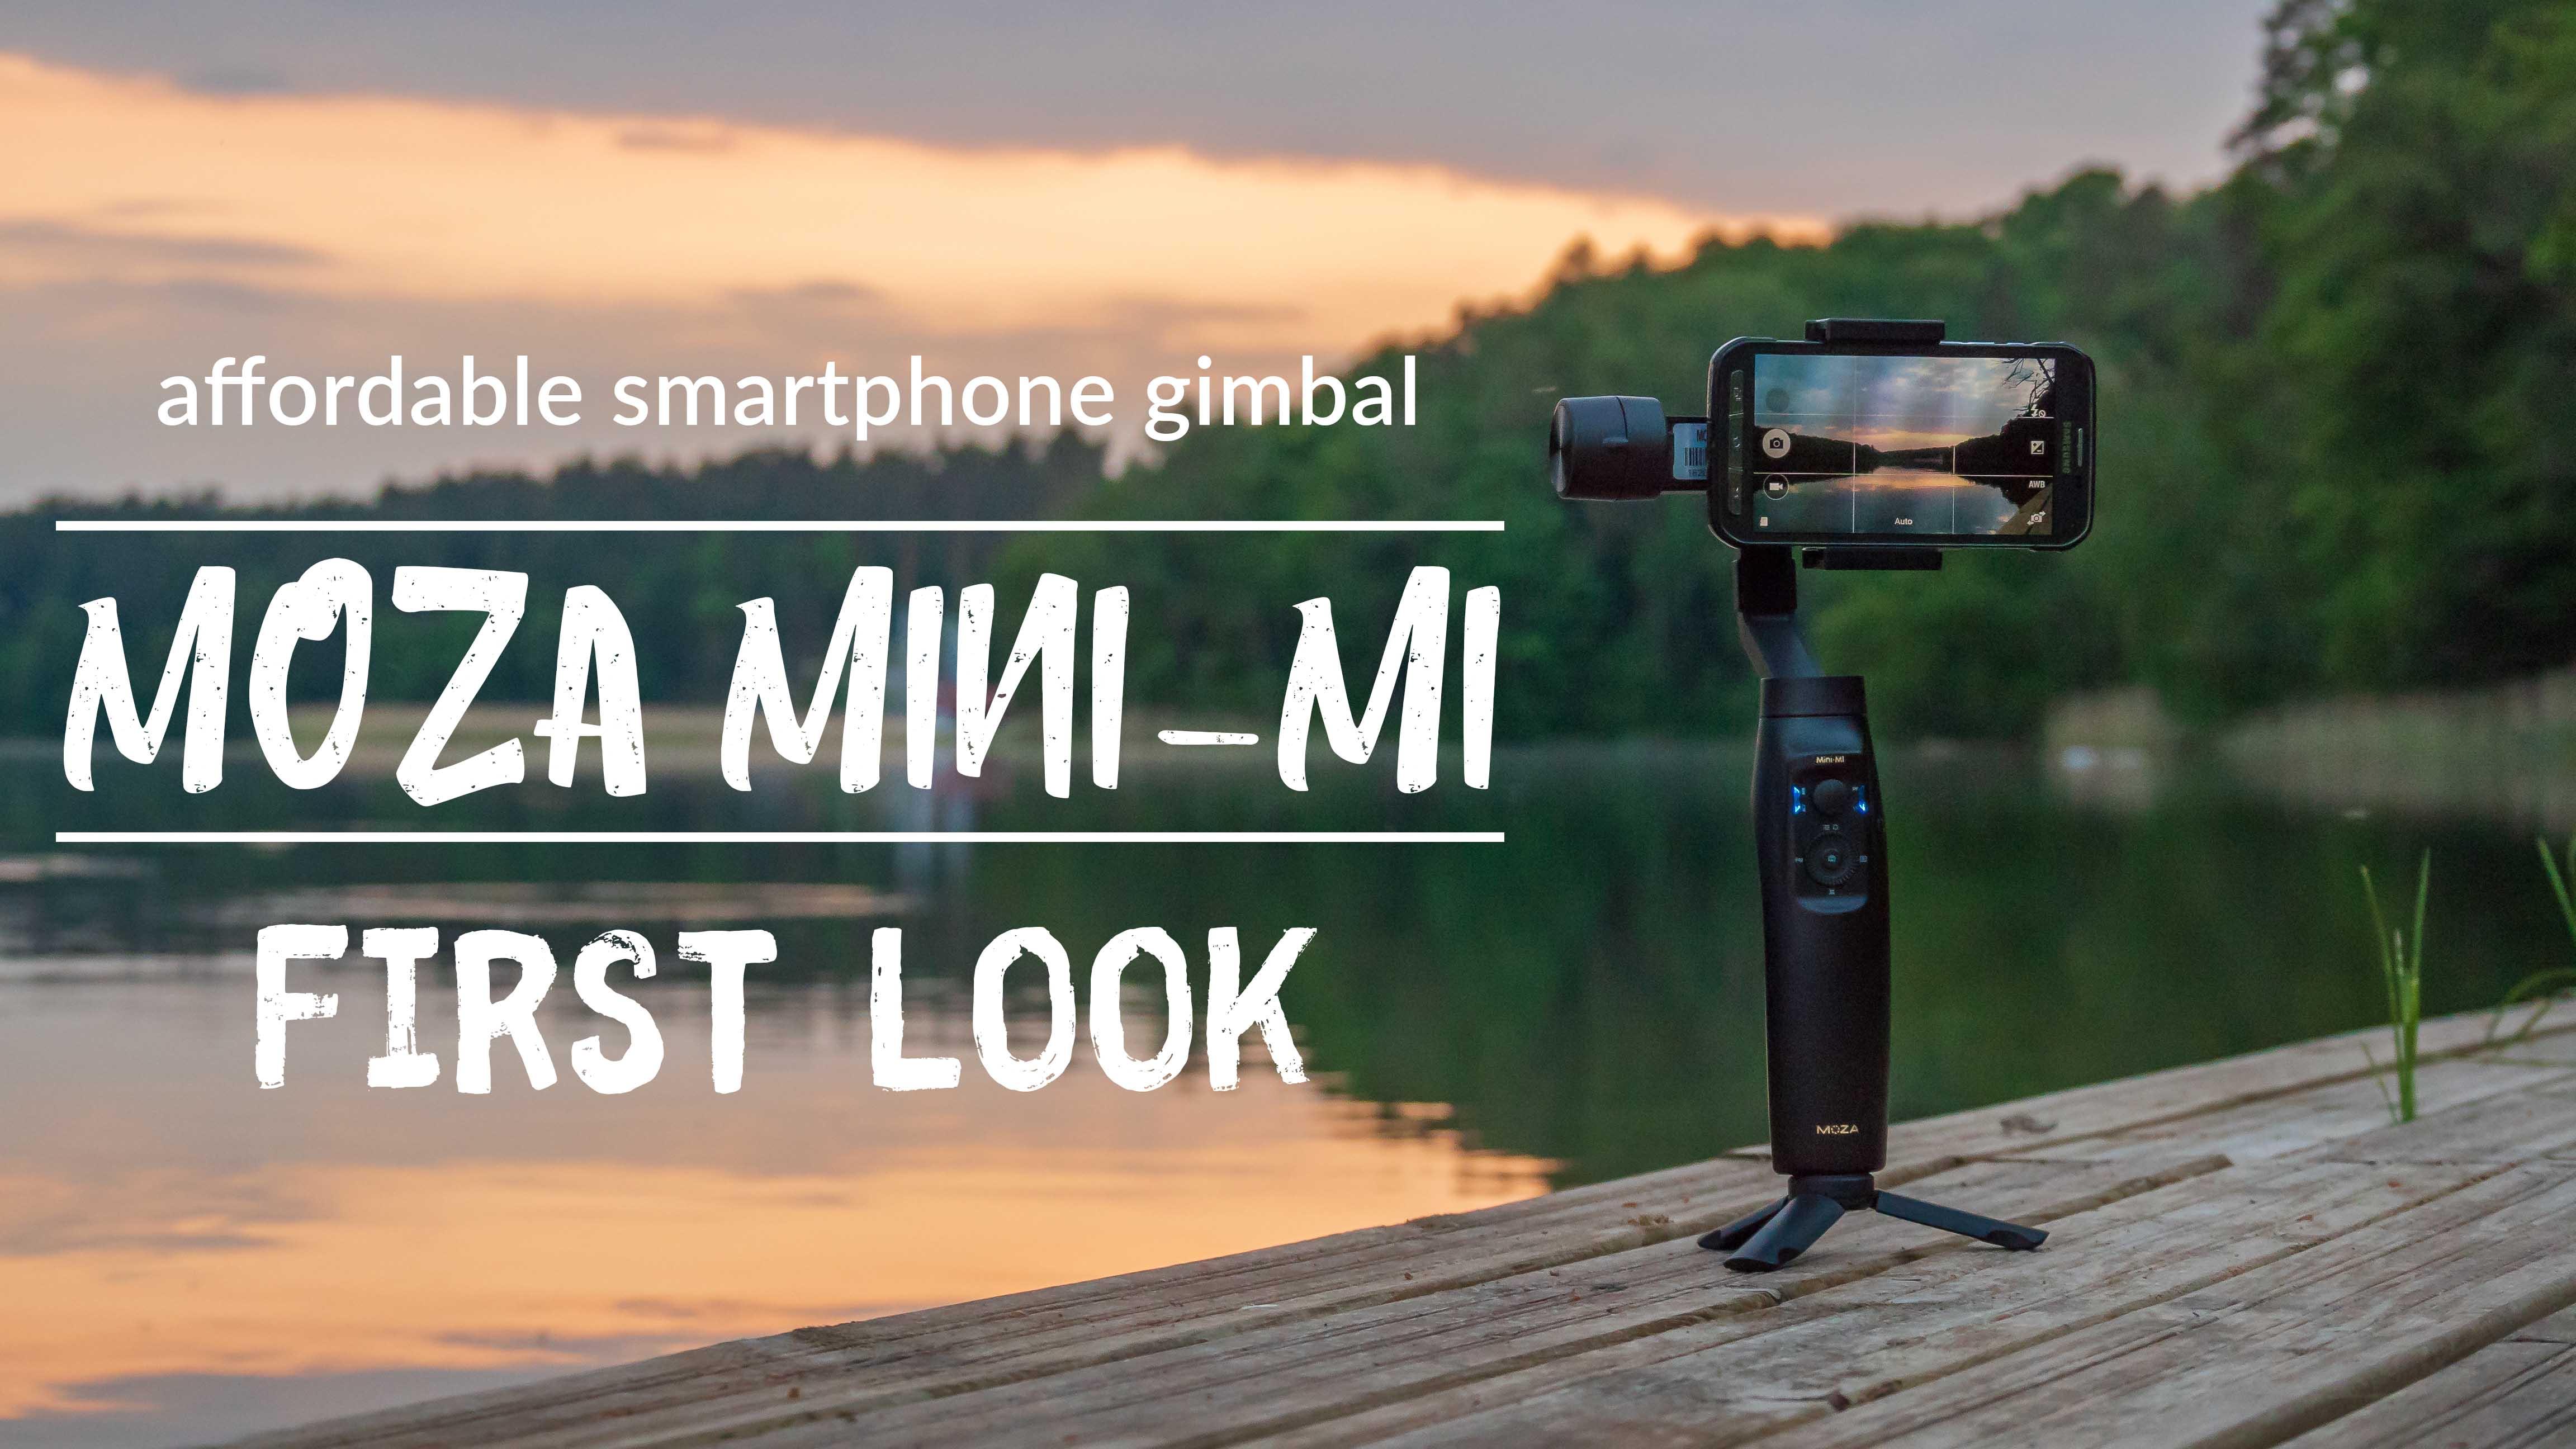 Affordable Smartphone Gimbal Moza Mini-Mi - First Impression ... 9caf9d8951